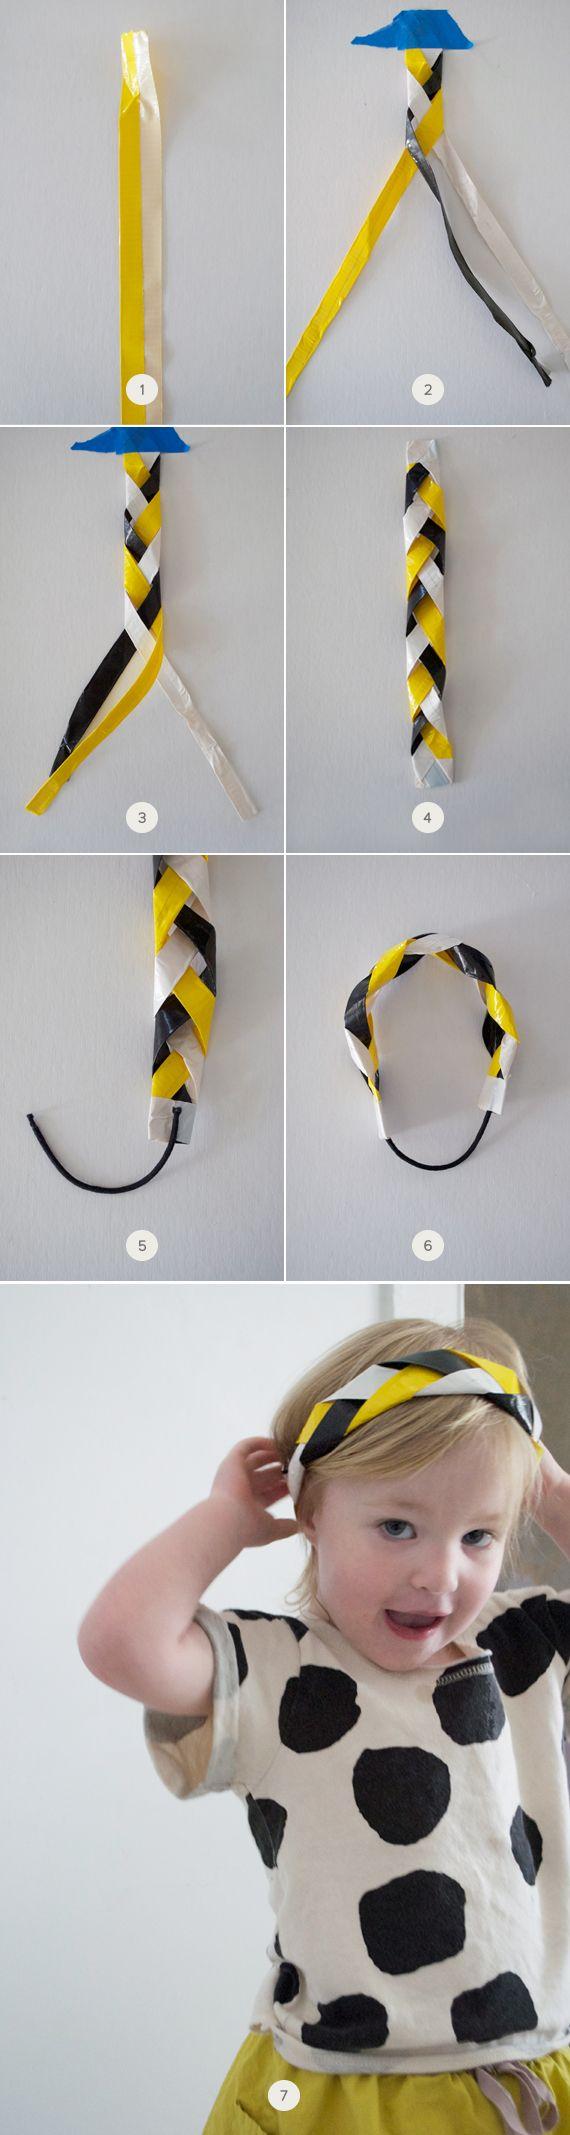 DIY: Braided Duct-Tape Headband